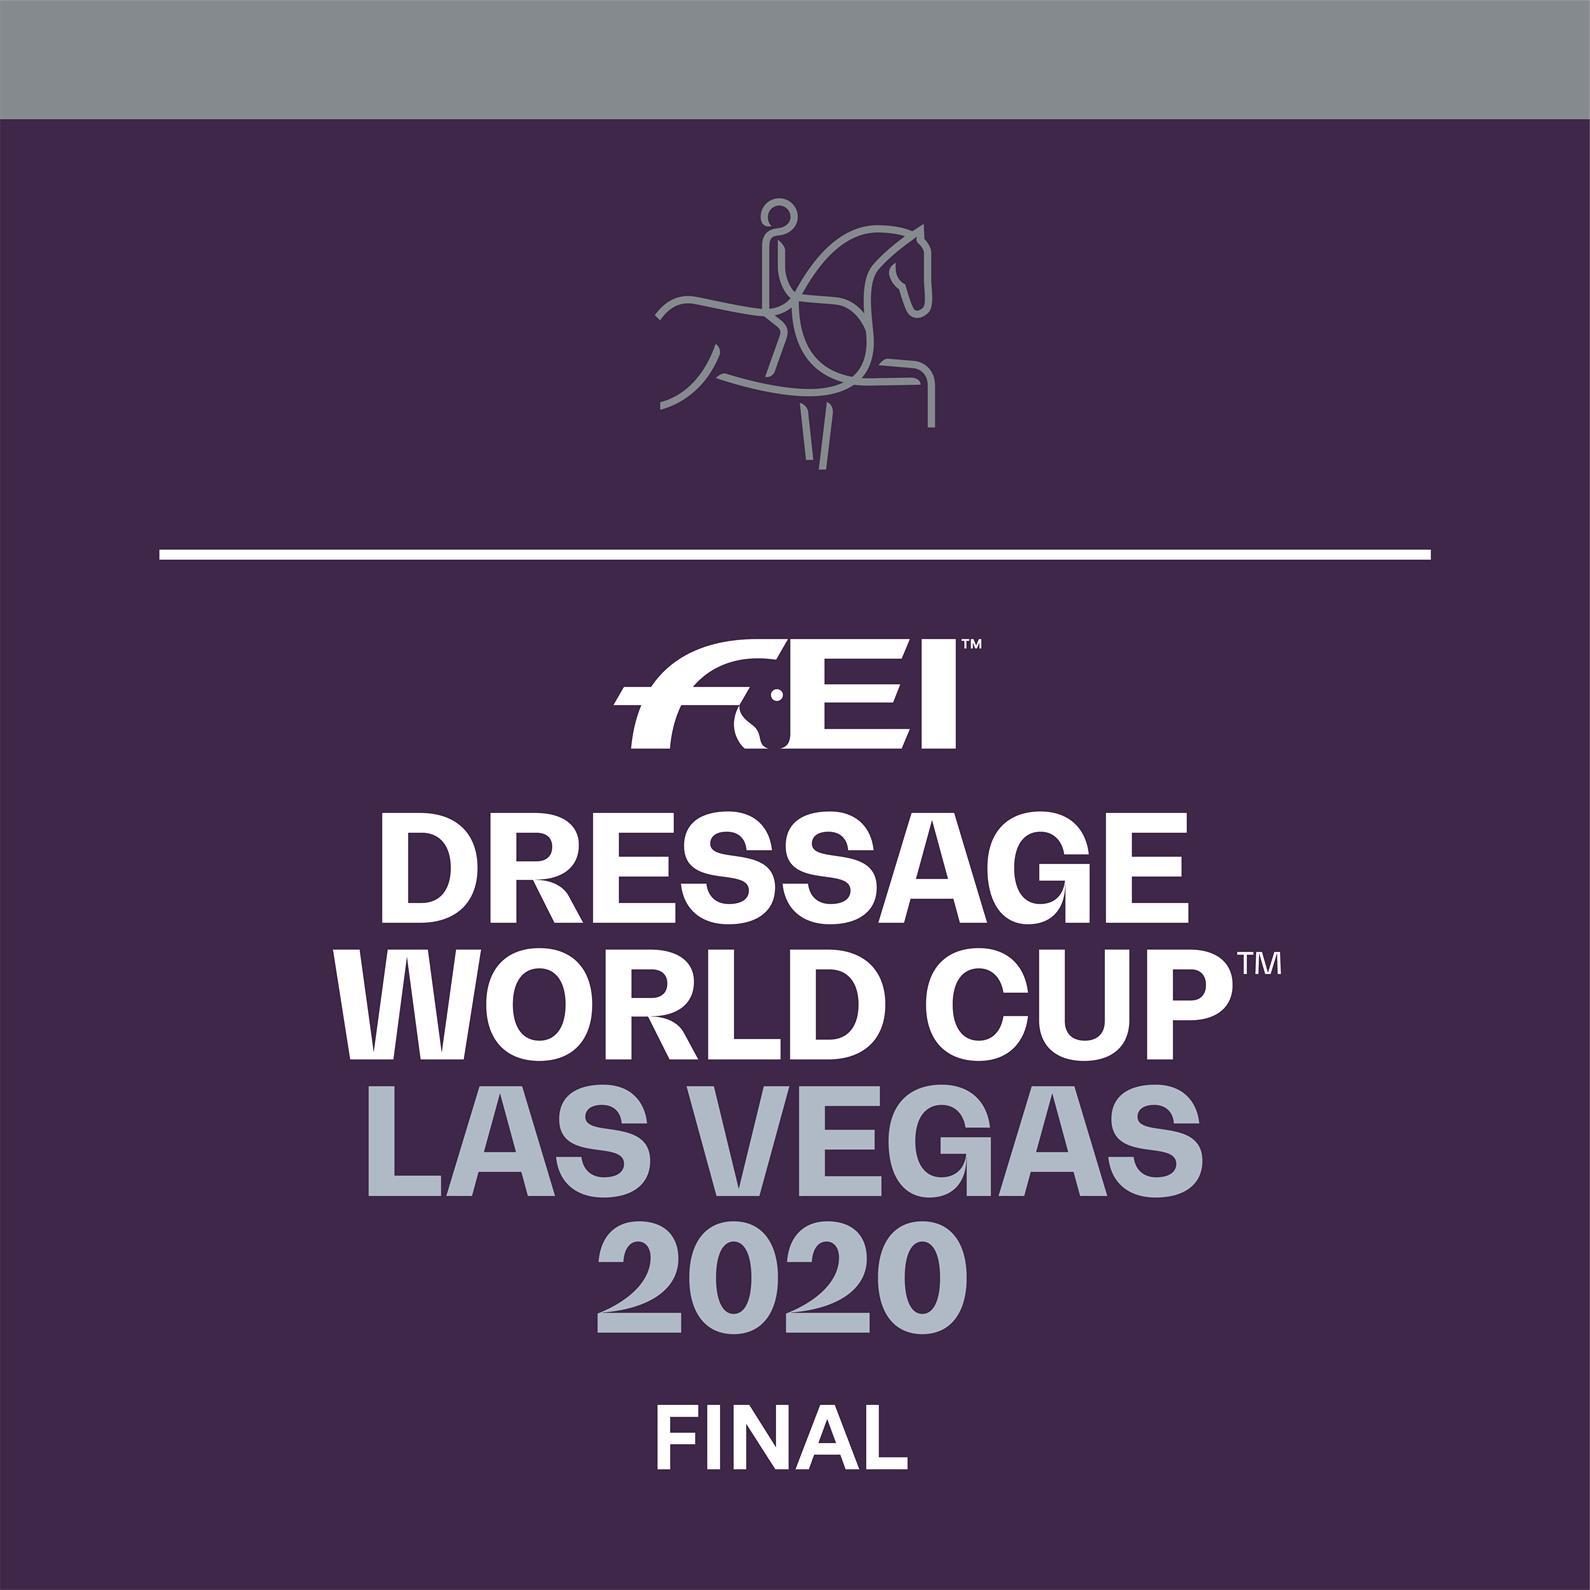 Dressage World Cup Finals - Las Vegas 2020